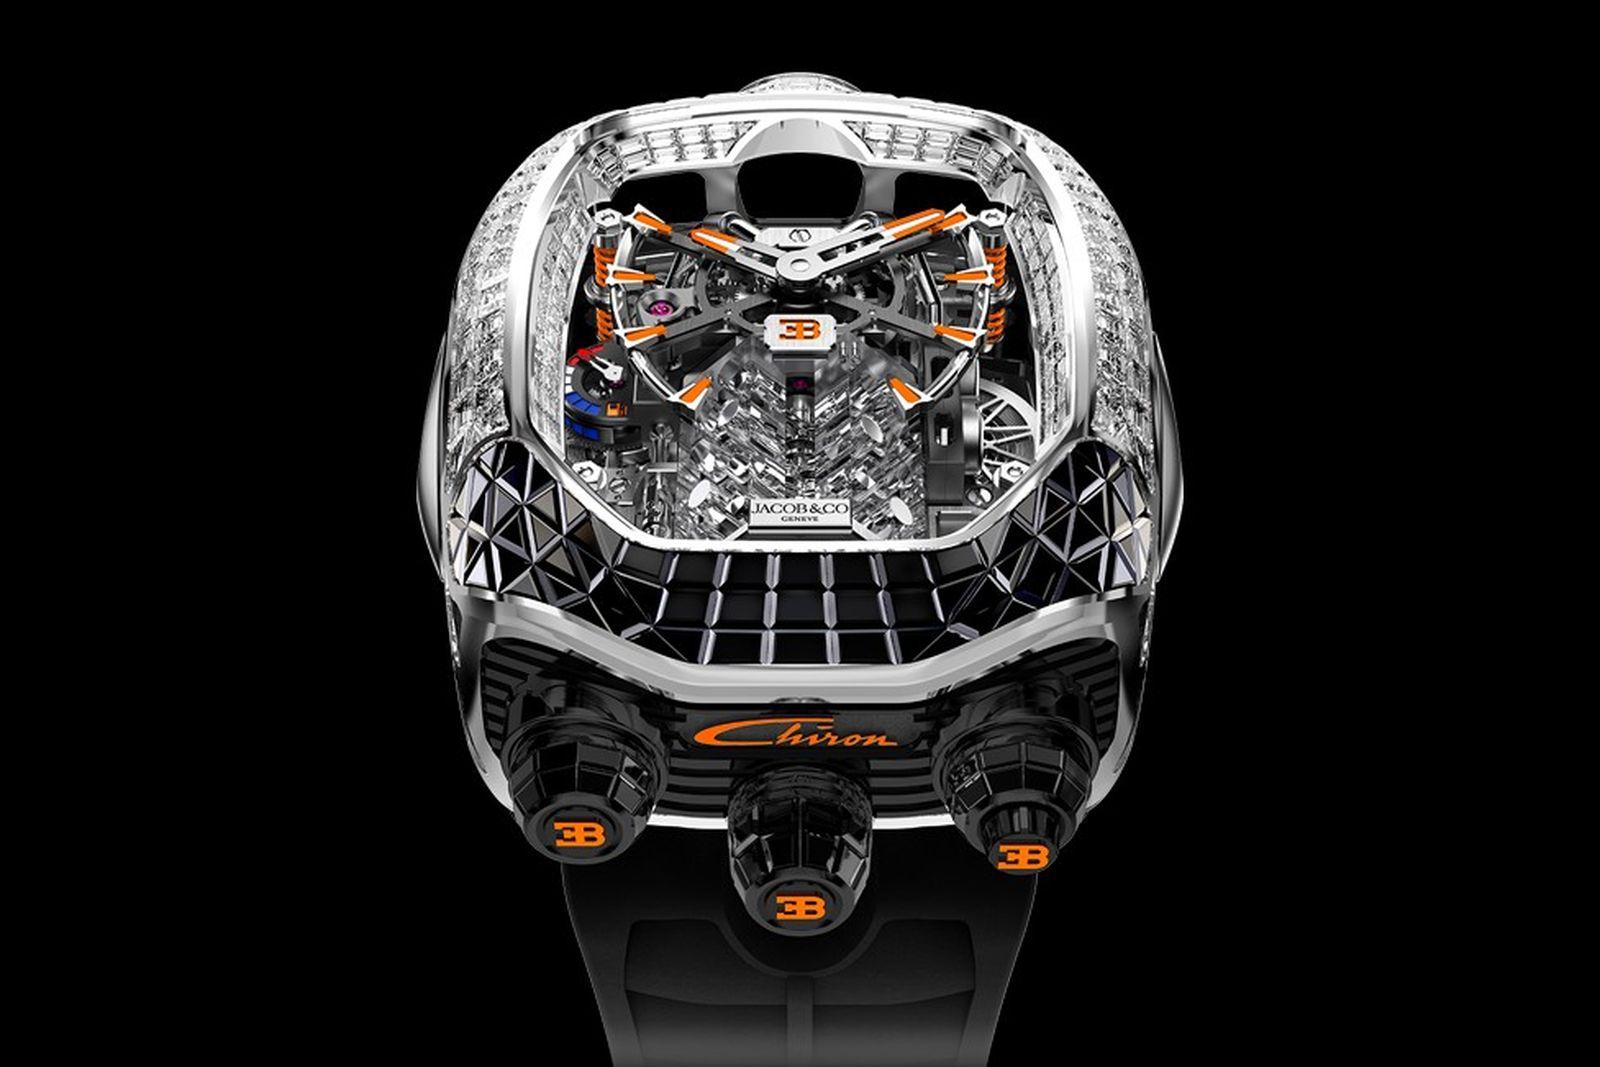 jacob-and-co-bugatti-chiron-tourbillon-black-orange-01